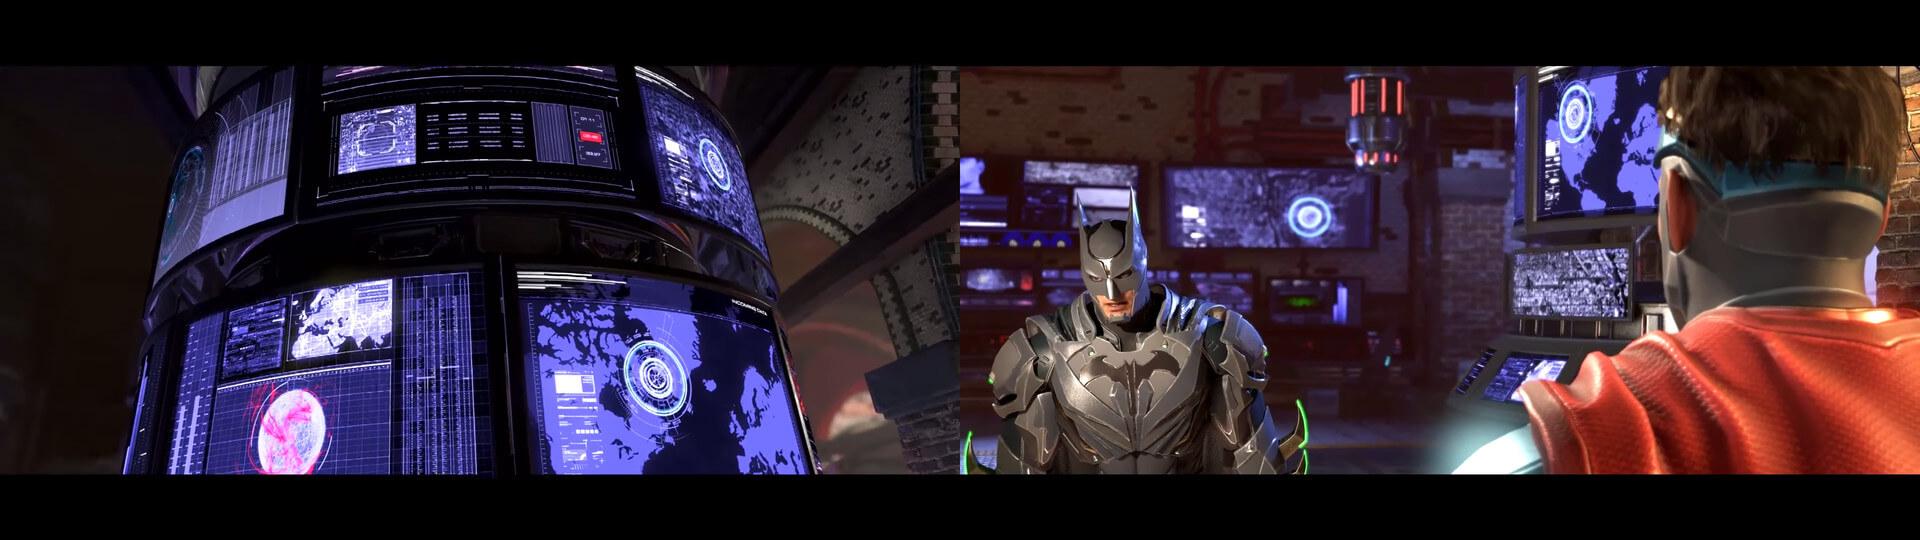 Atomhawk_Warner-Bros-NetherRealm_Injustice-2_UI-Design_Screen-In-Game-Cinematics_Example-2.jpg